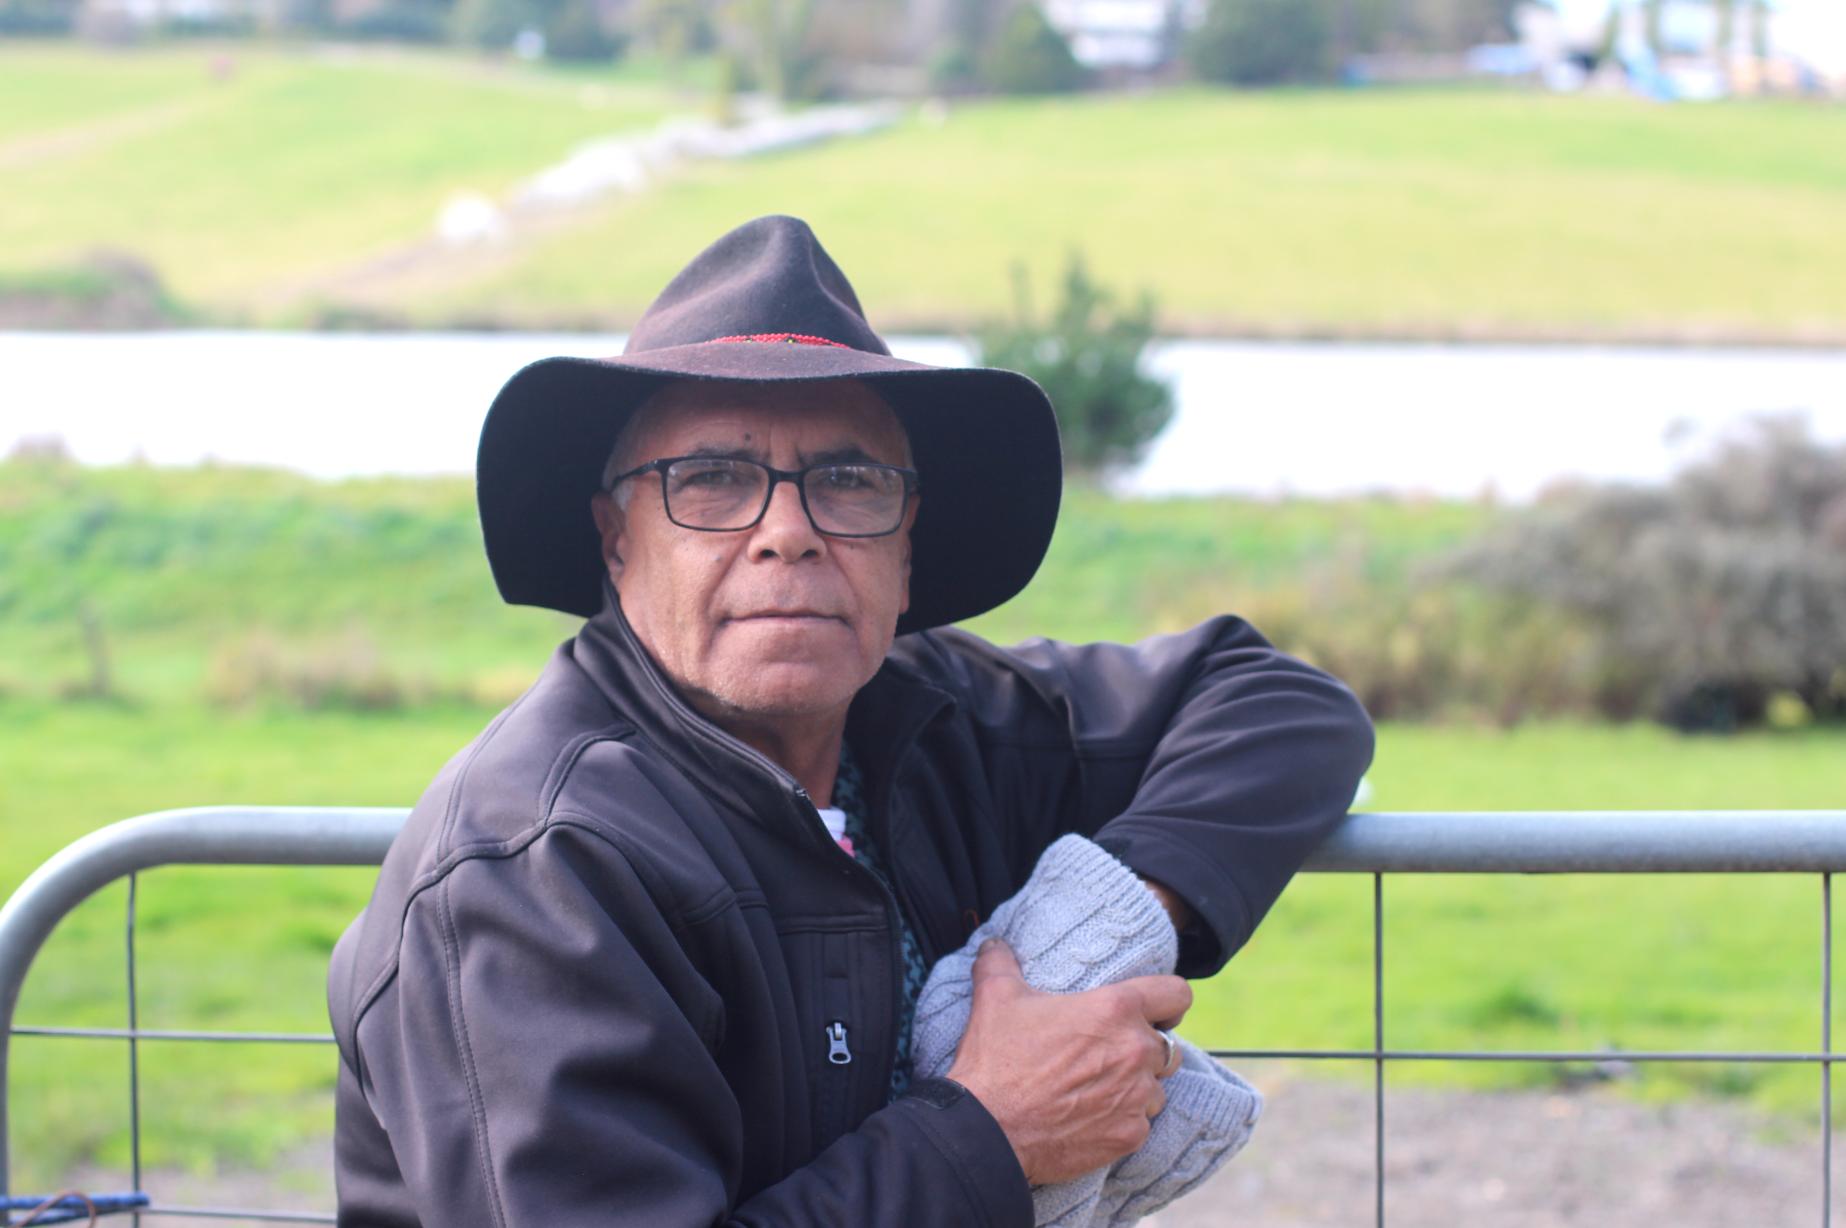 Shane Charles at Coranderrk. July 2021 Photograph by Gabby Harcourt